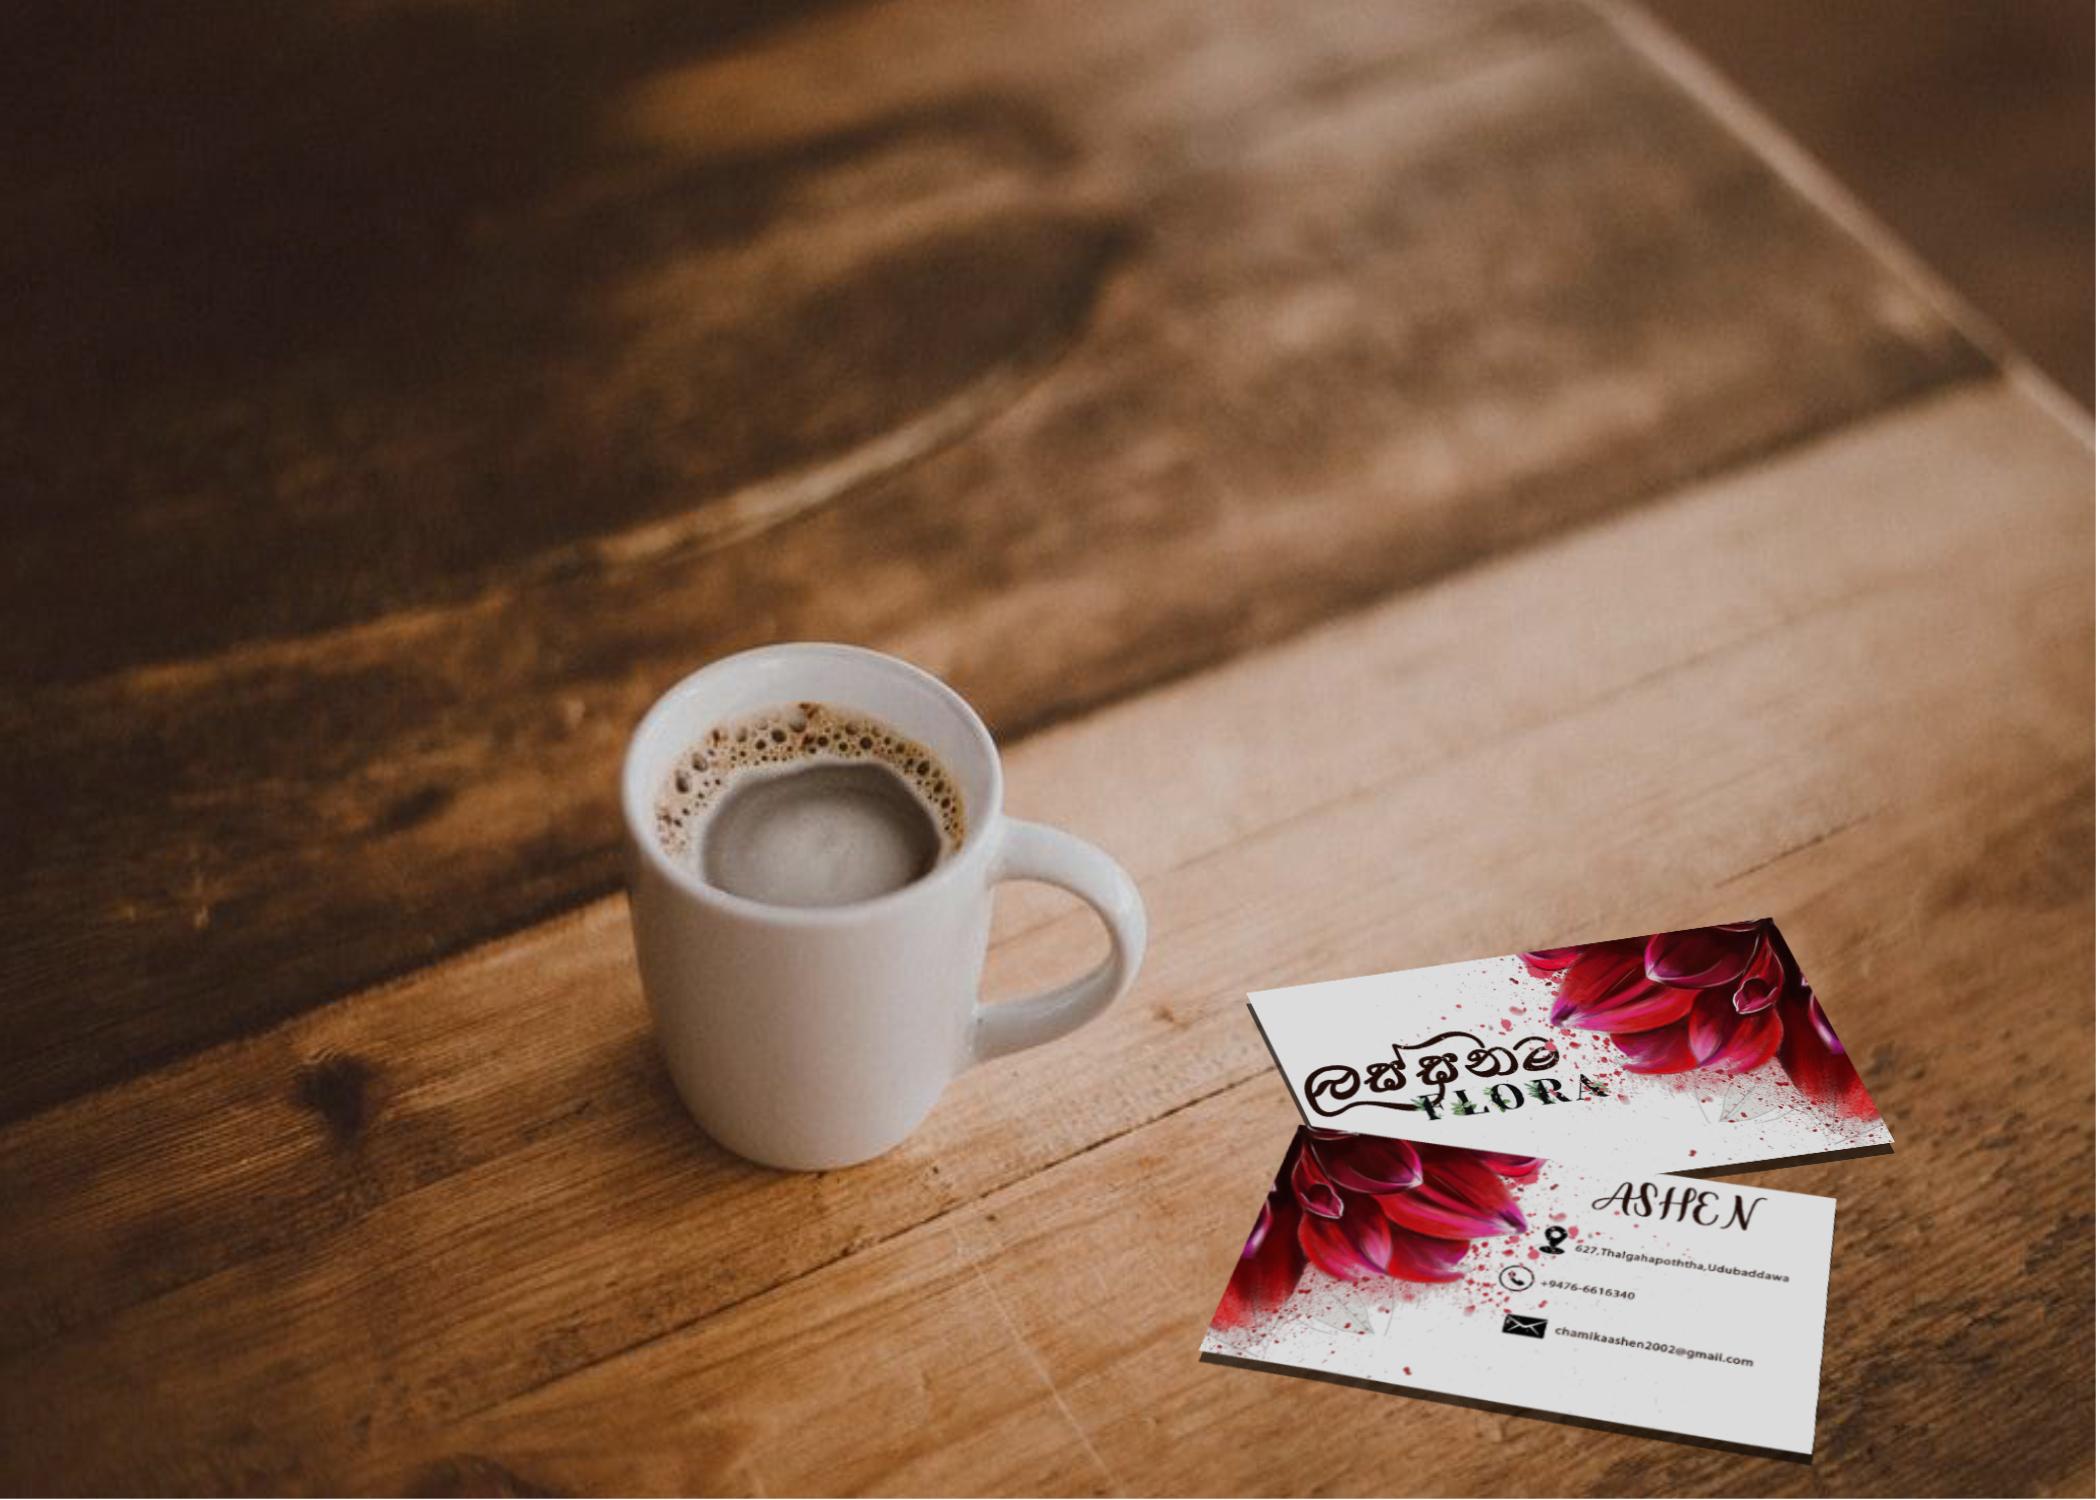 I will do creative business card and logo design